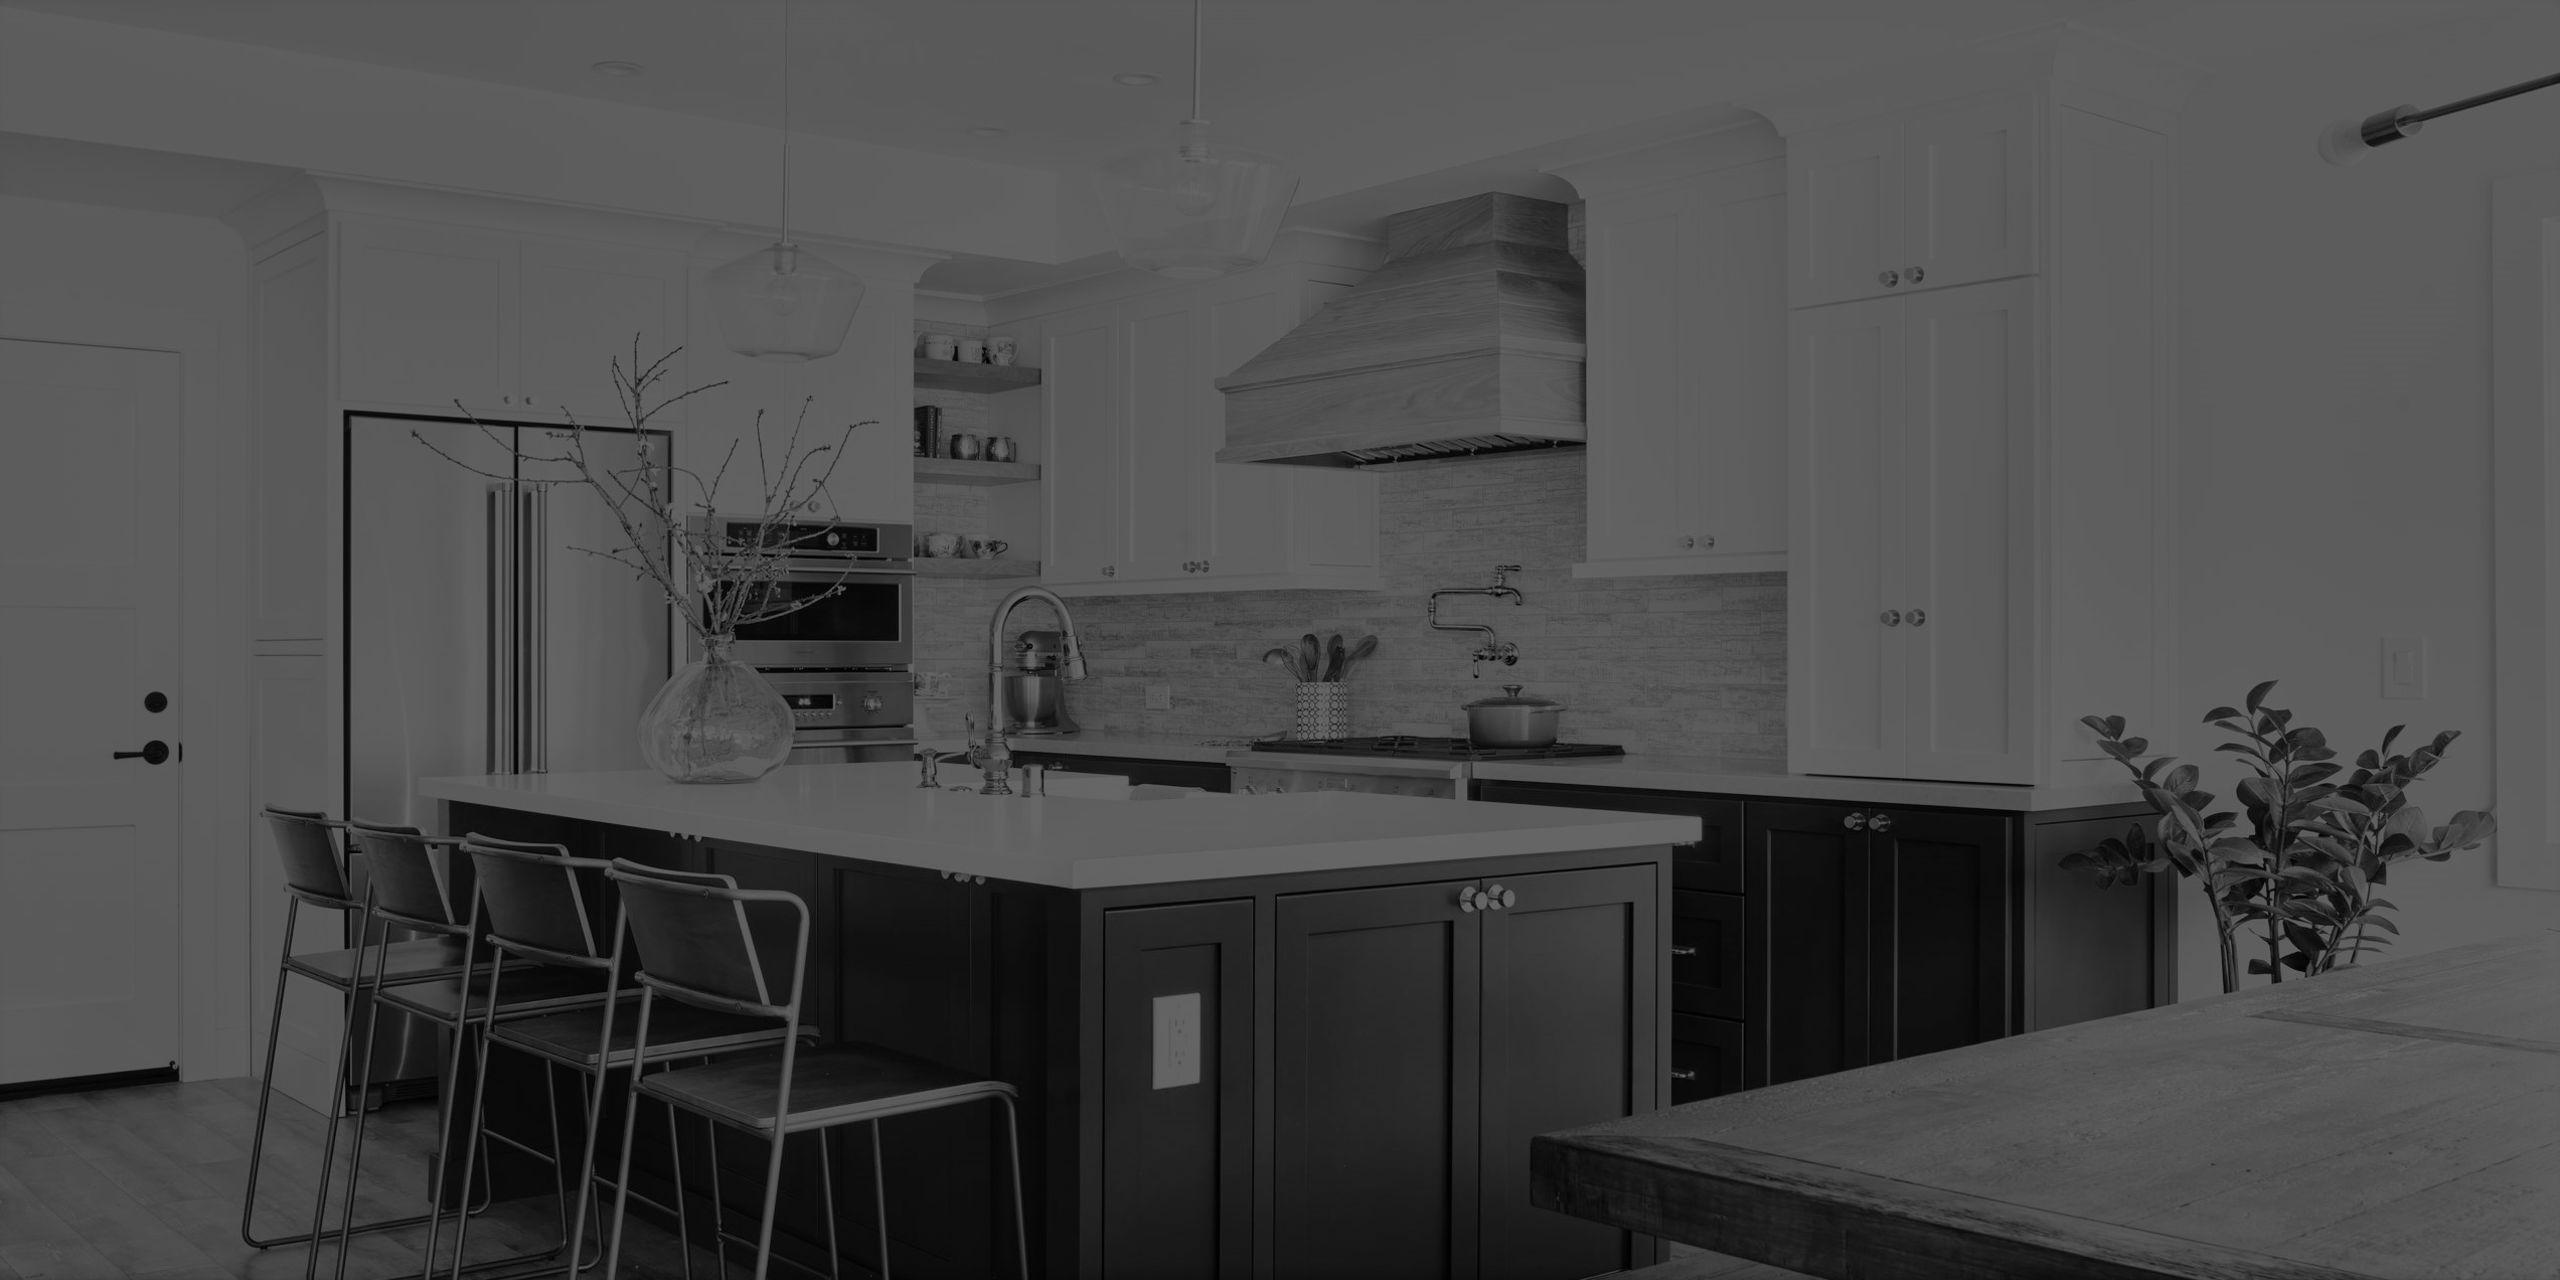 Top Takeaways From the 2021 U.S. Houzz Kitchen Trends Study